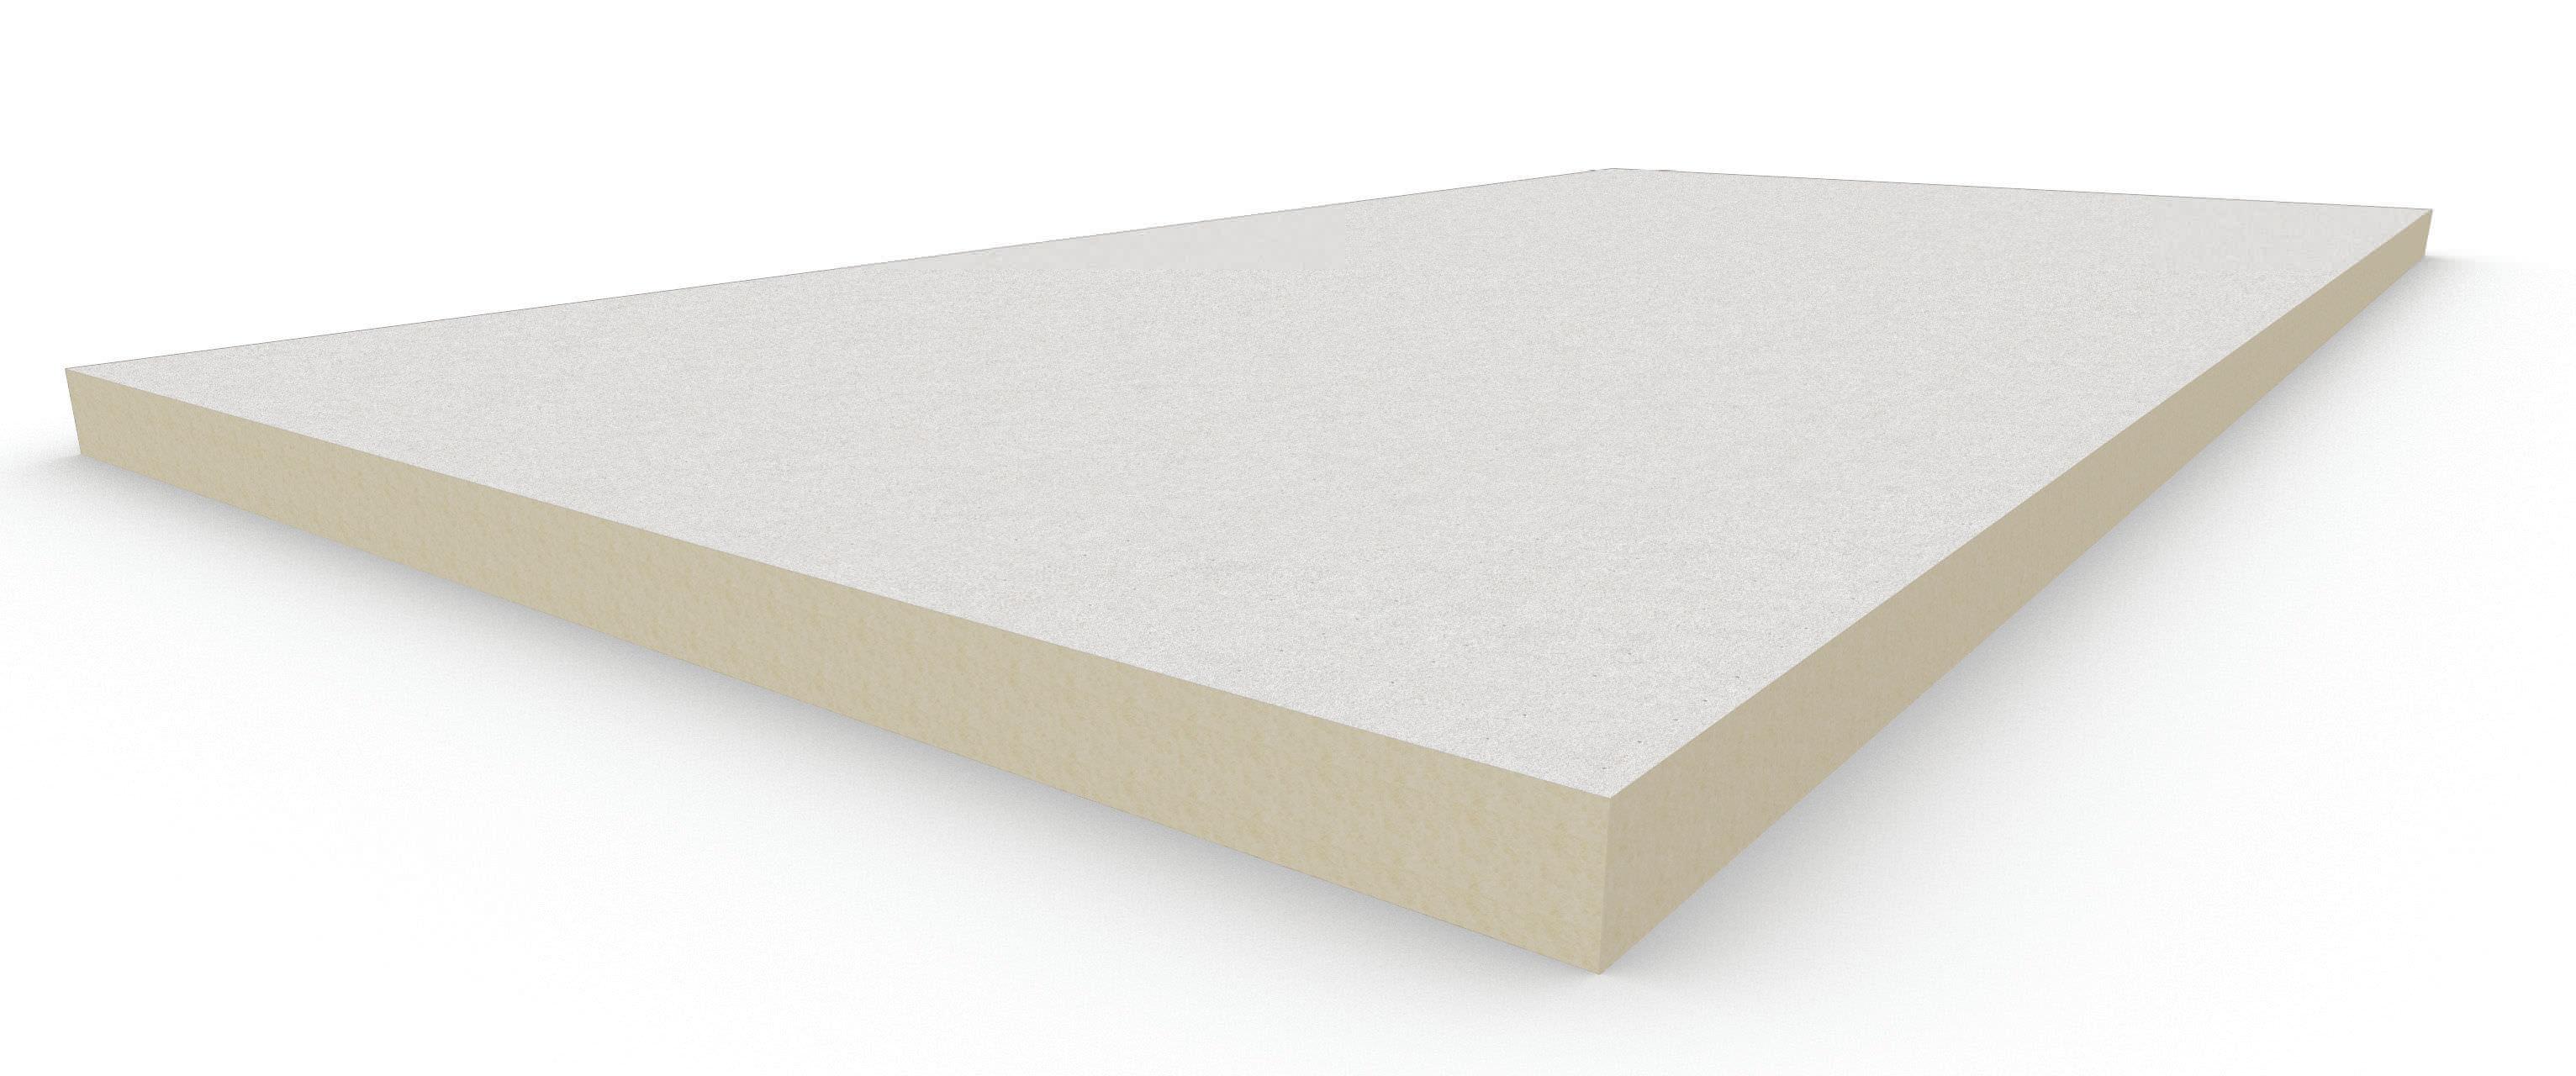 H Shield Premier Polyiso Roof Panel